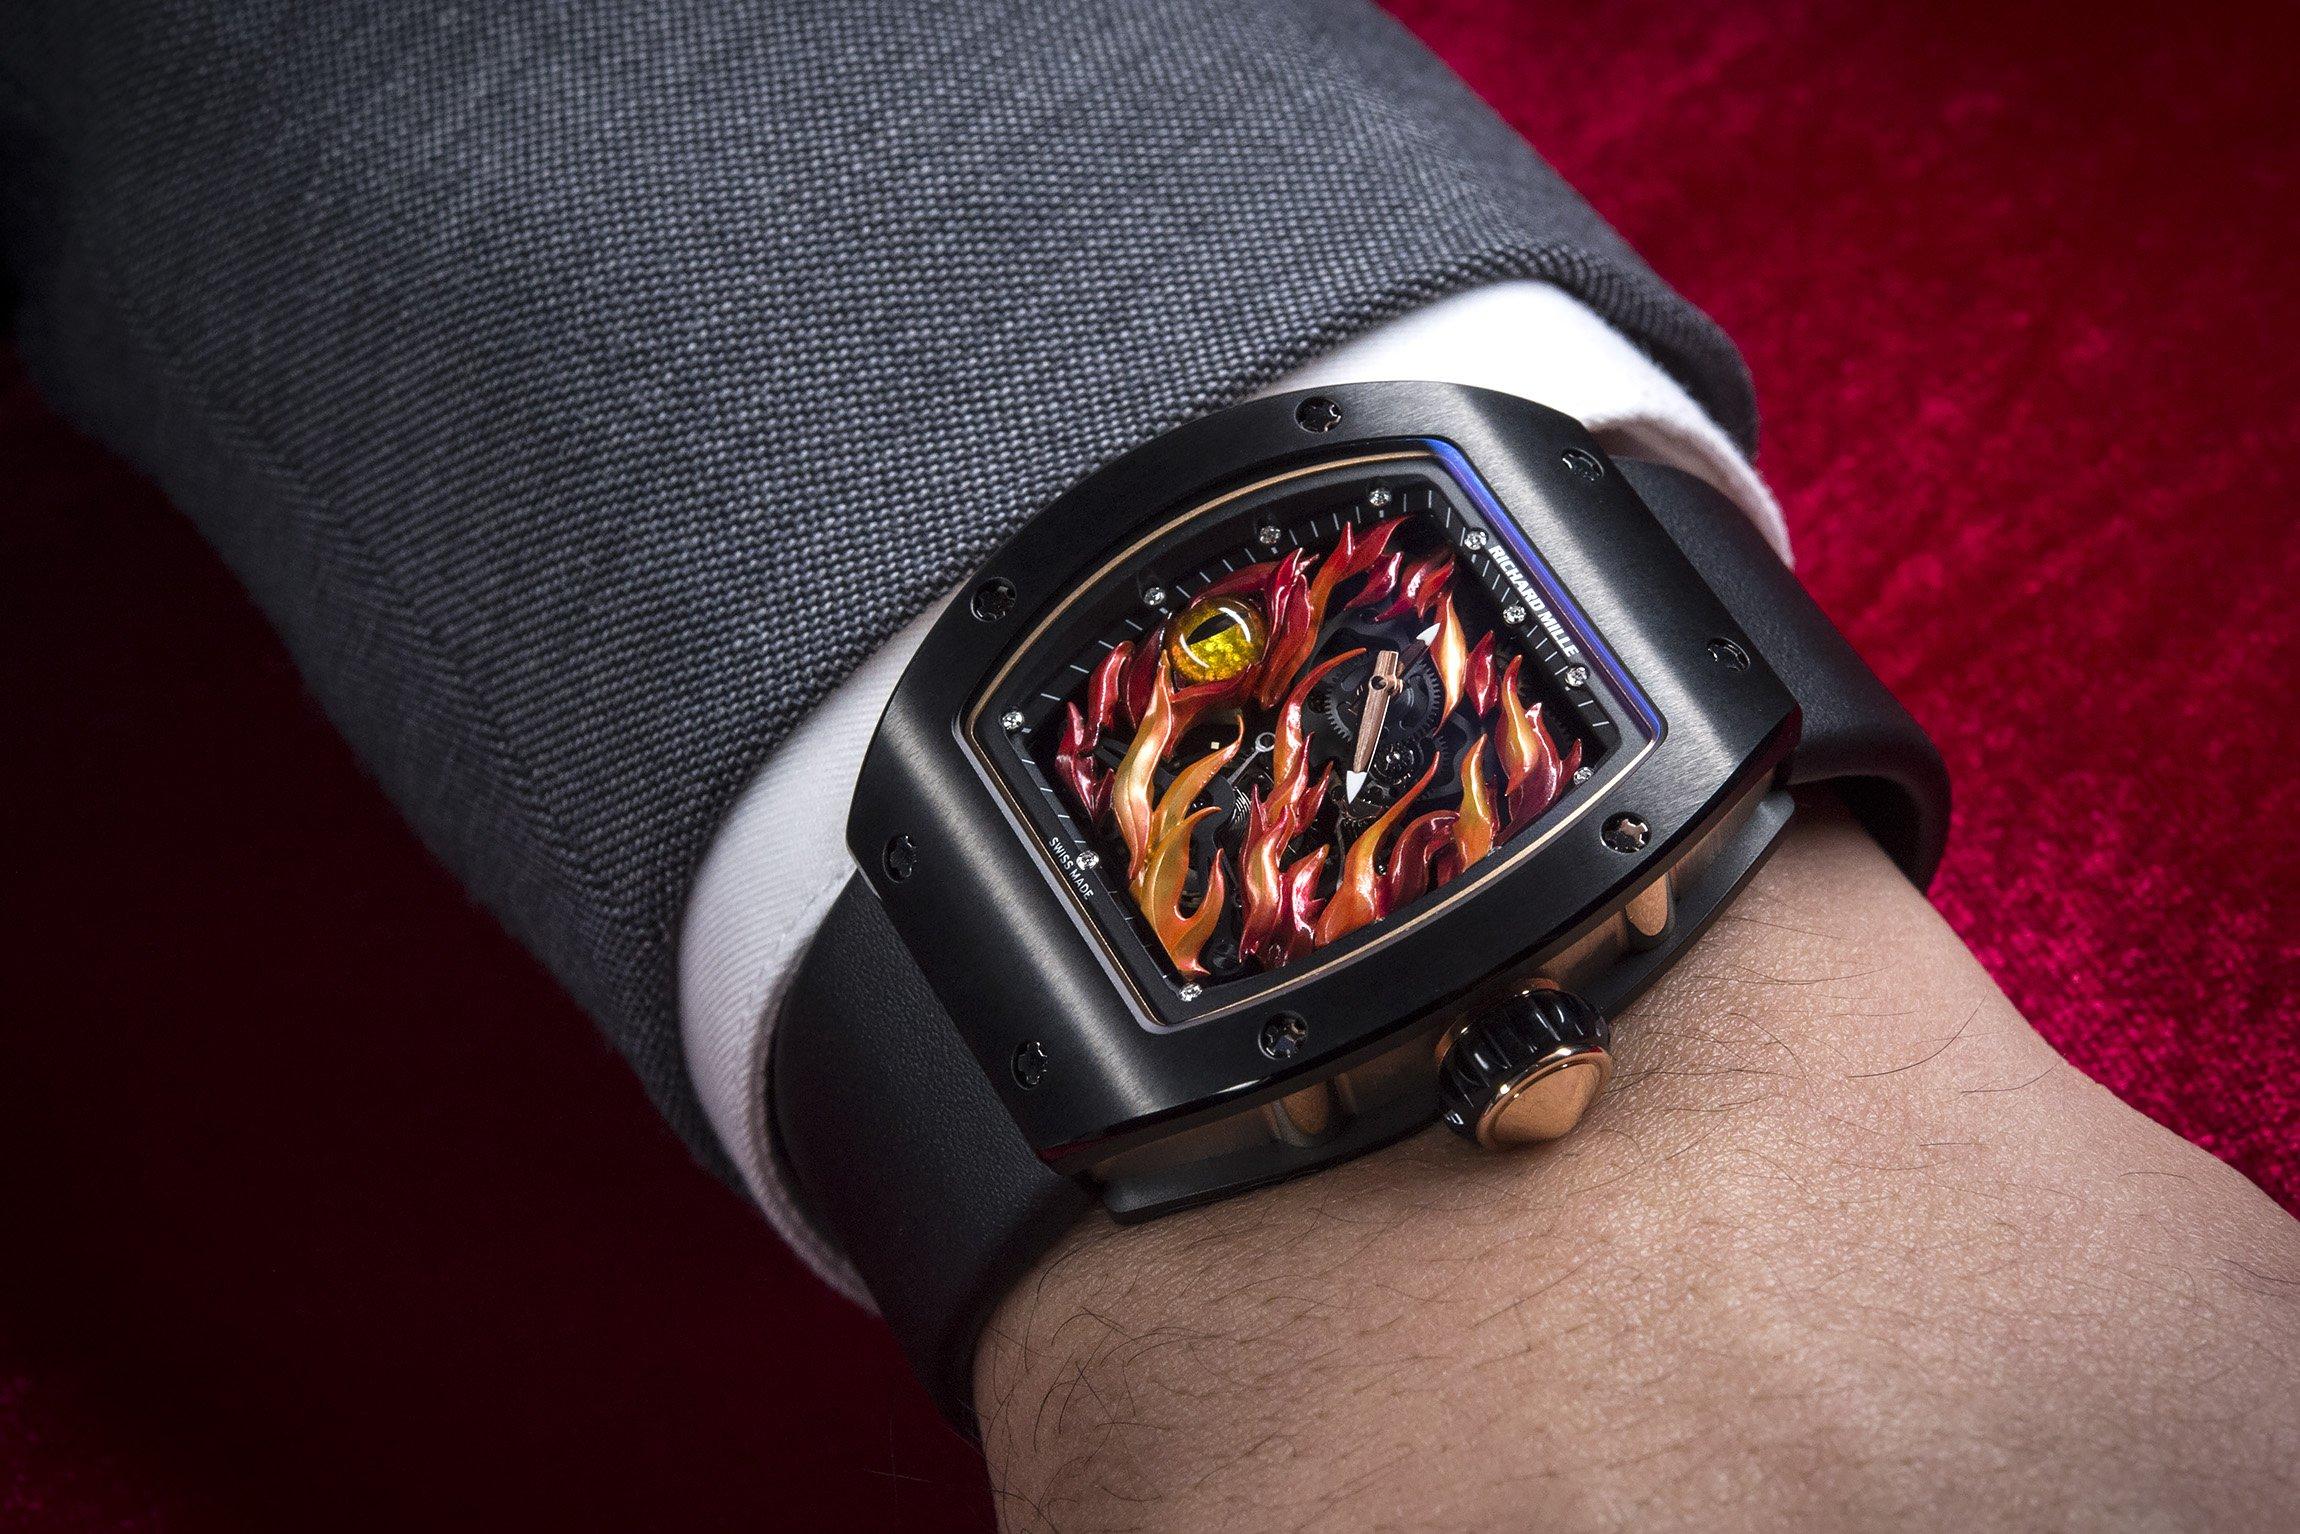 Richard-Mille-Evil-Eye-RM-26-02-Tourbillon-Watch-Watches-And-Wonders-2015-Wrist